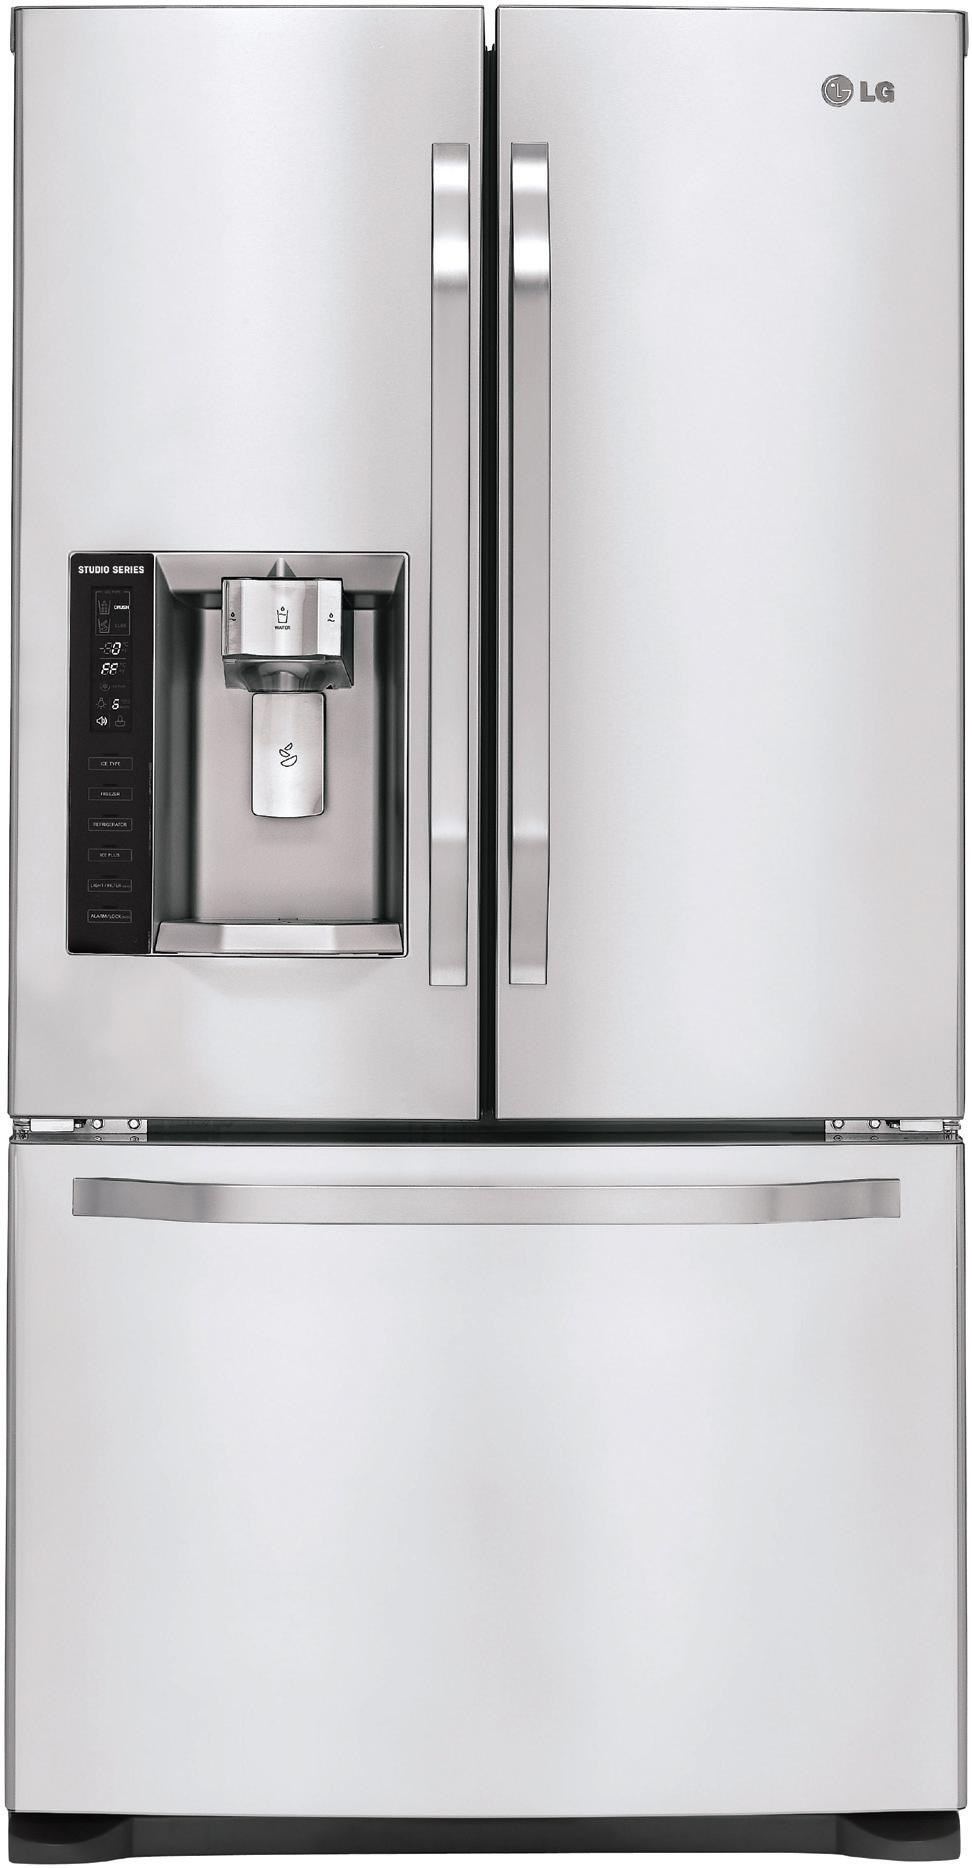 LG Appliances LG Studio Series20.5 Cu. Ft. French Door Refrigerator ...